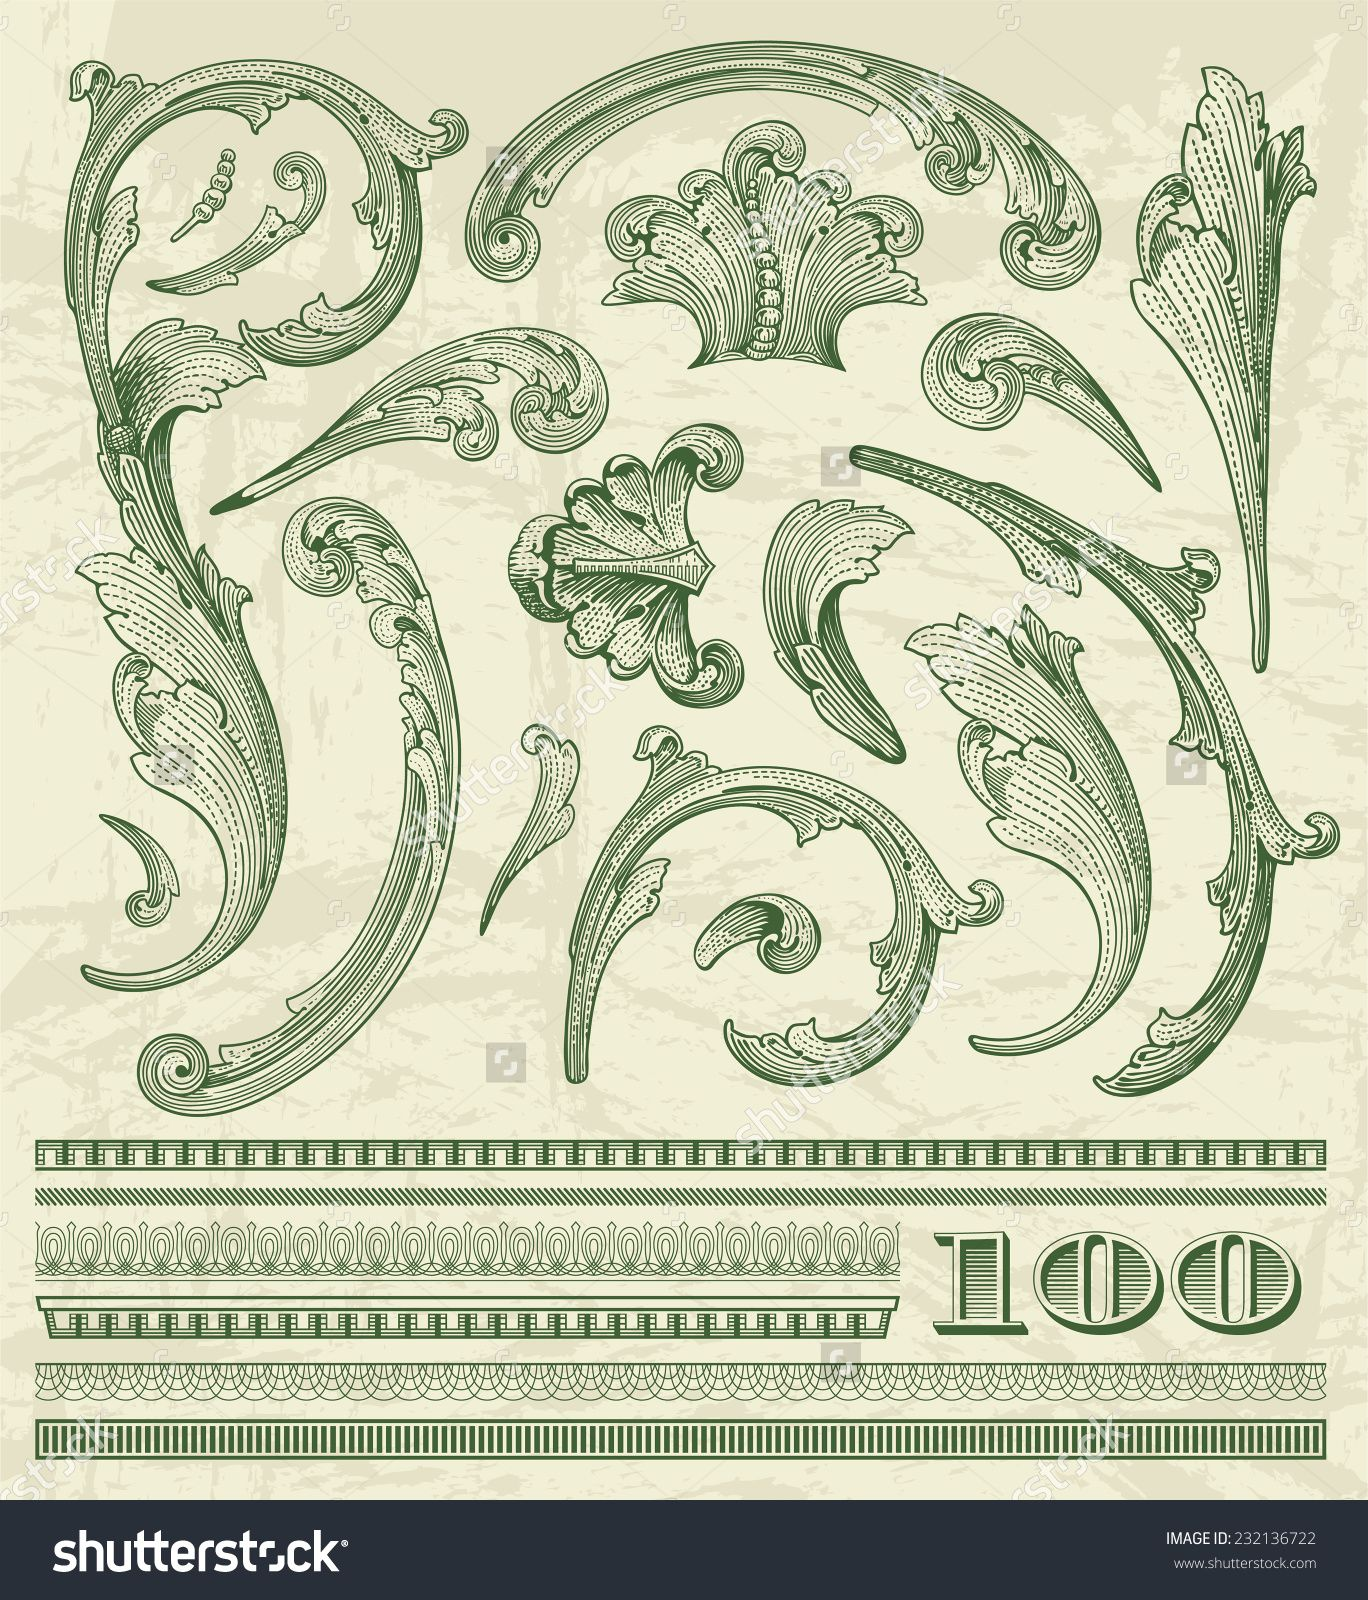 5416c3cda20 dollar sign filigree vector - Google Search